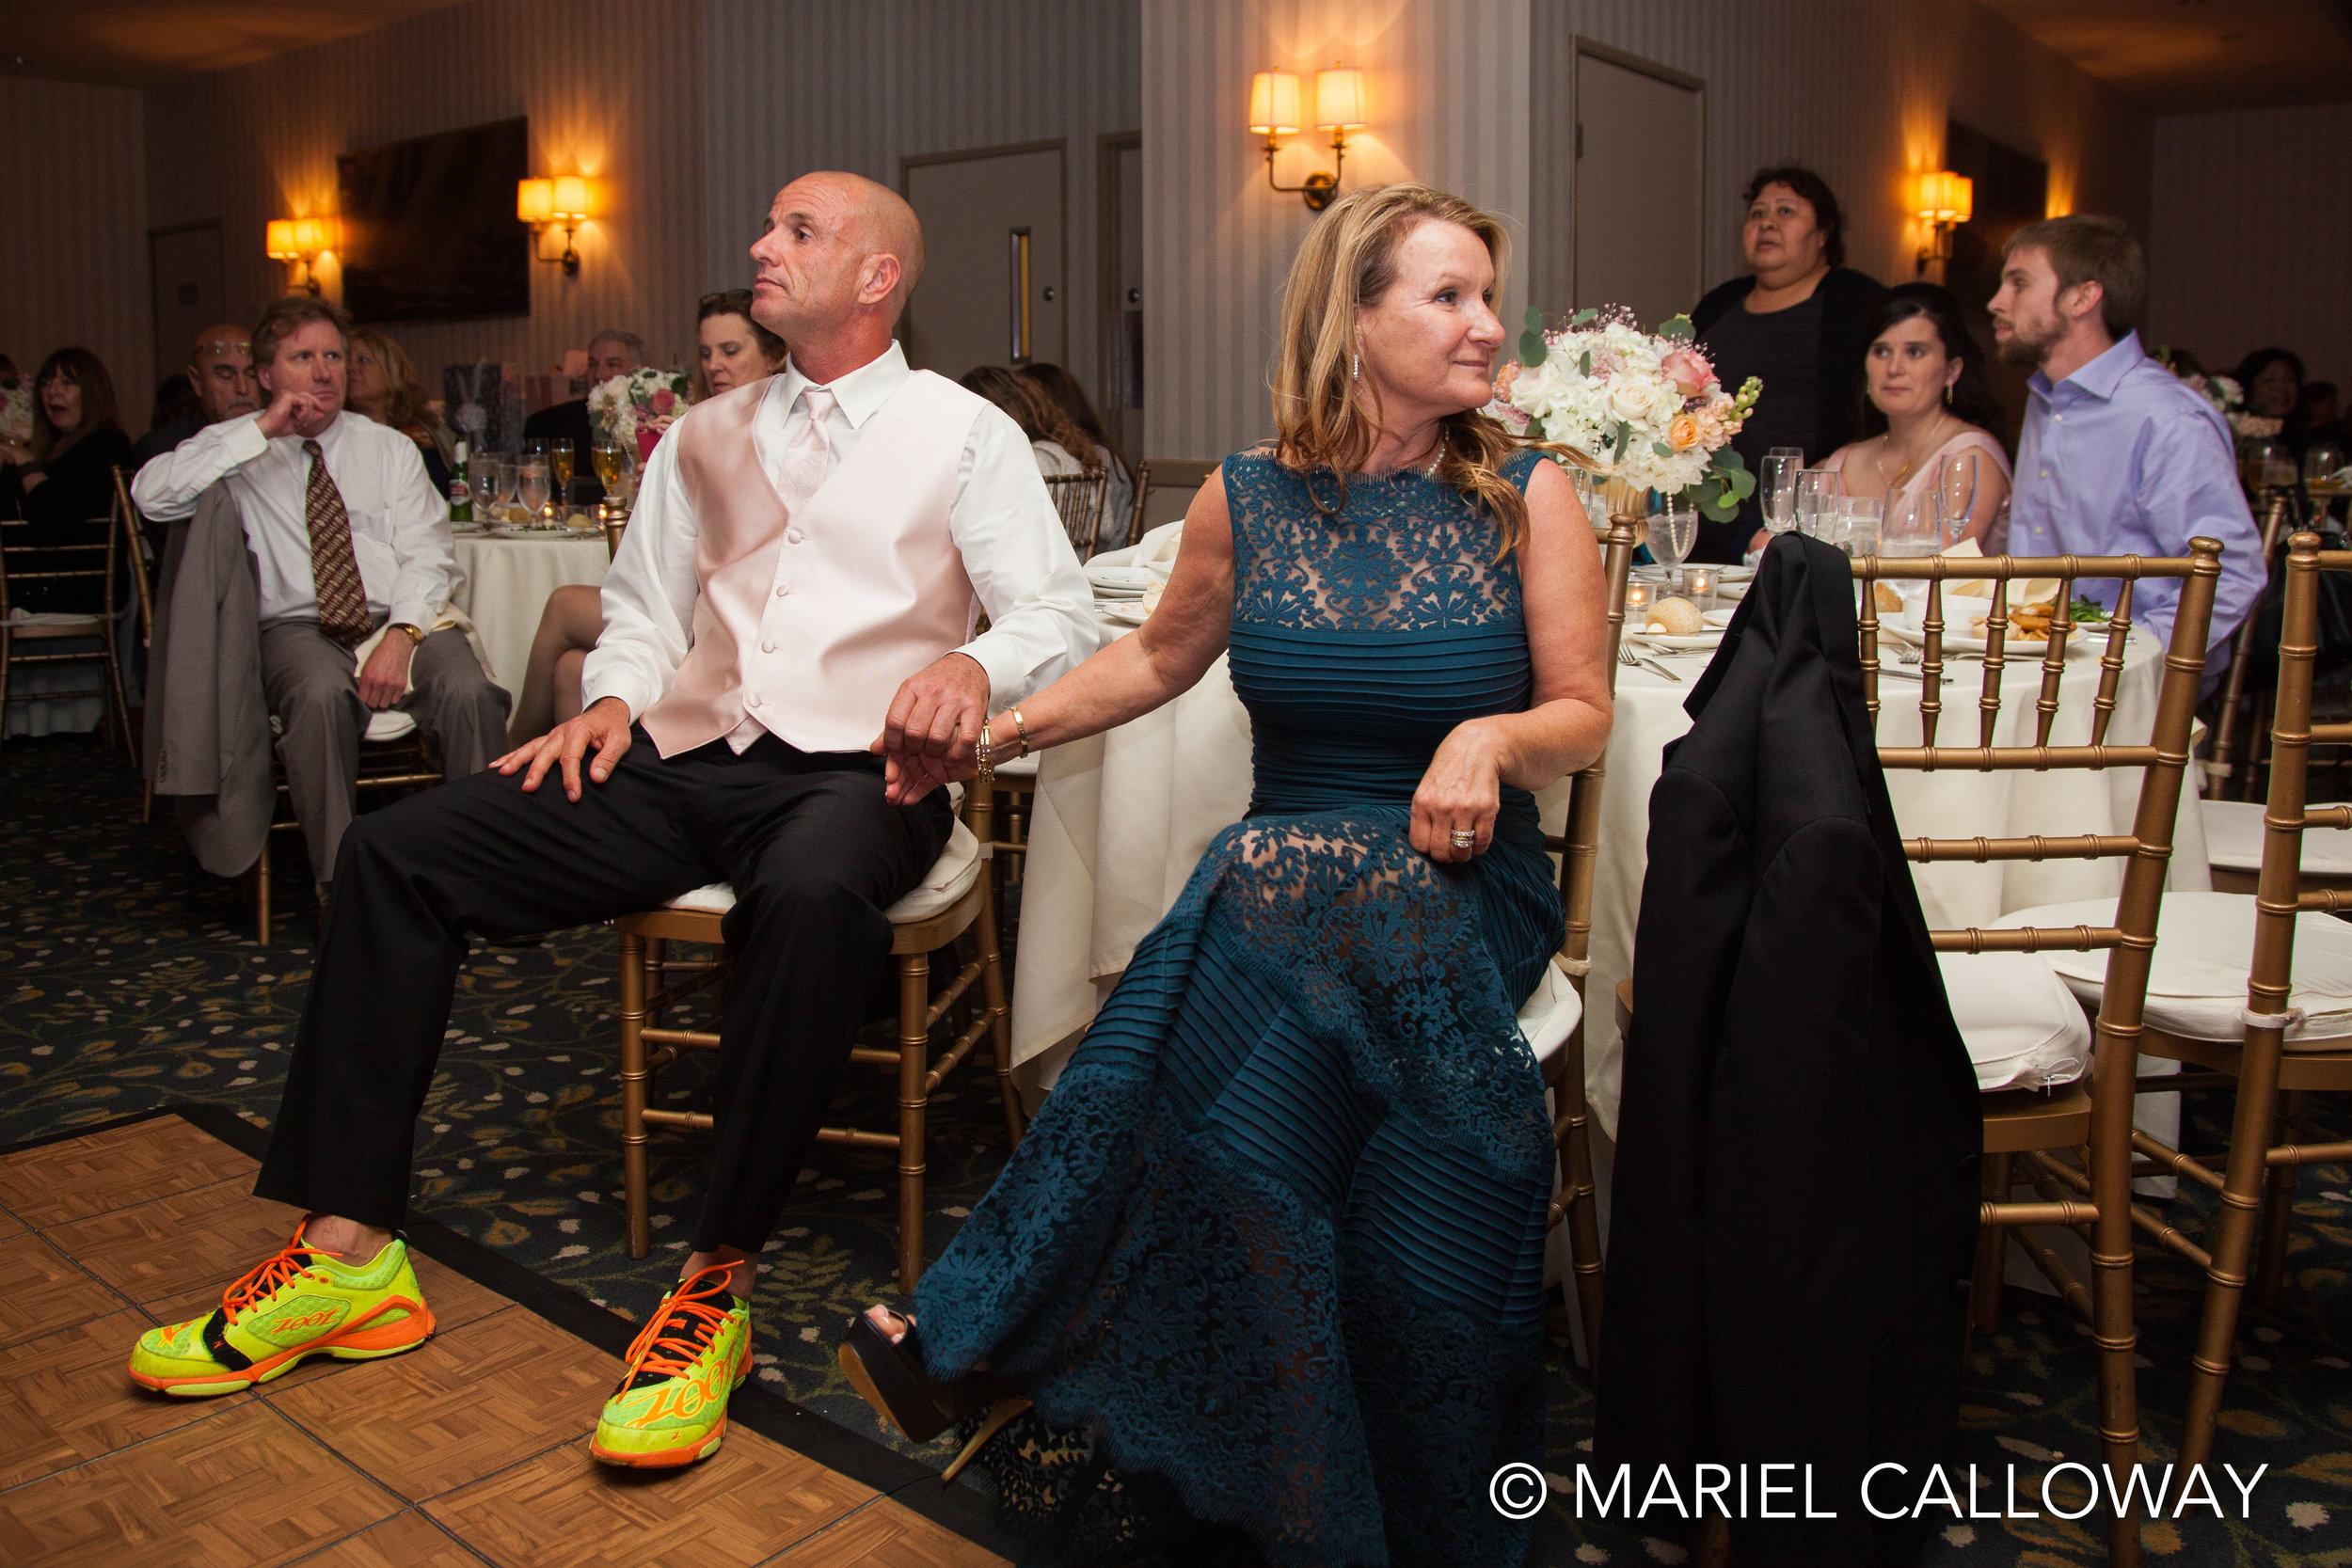 Mariel-Calloway-Los-Angeles-Wedding-Photography-Rossi-63.jpg